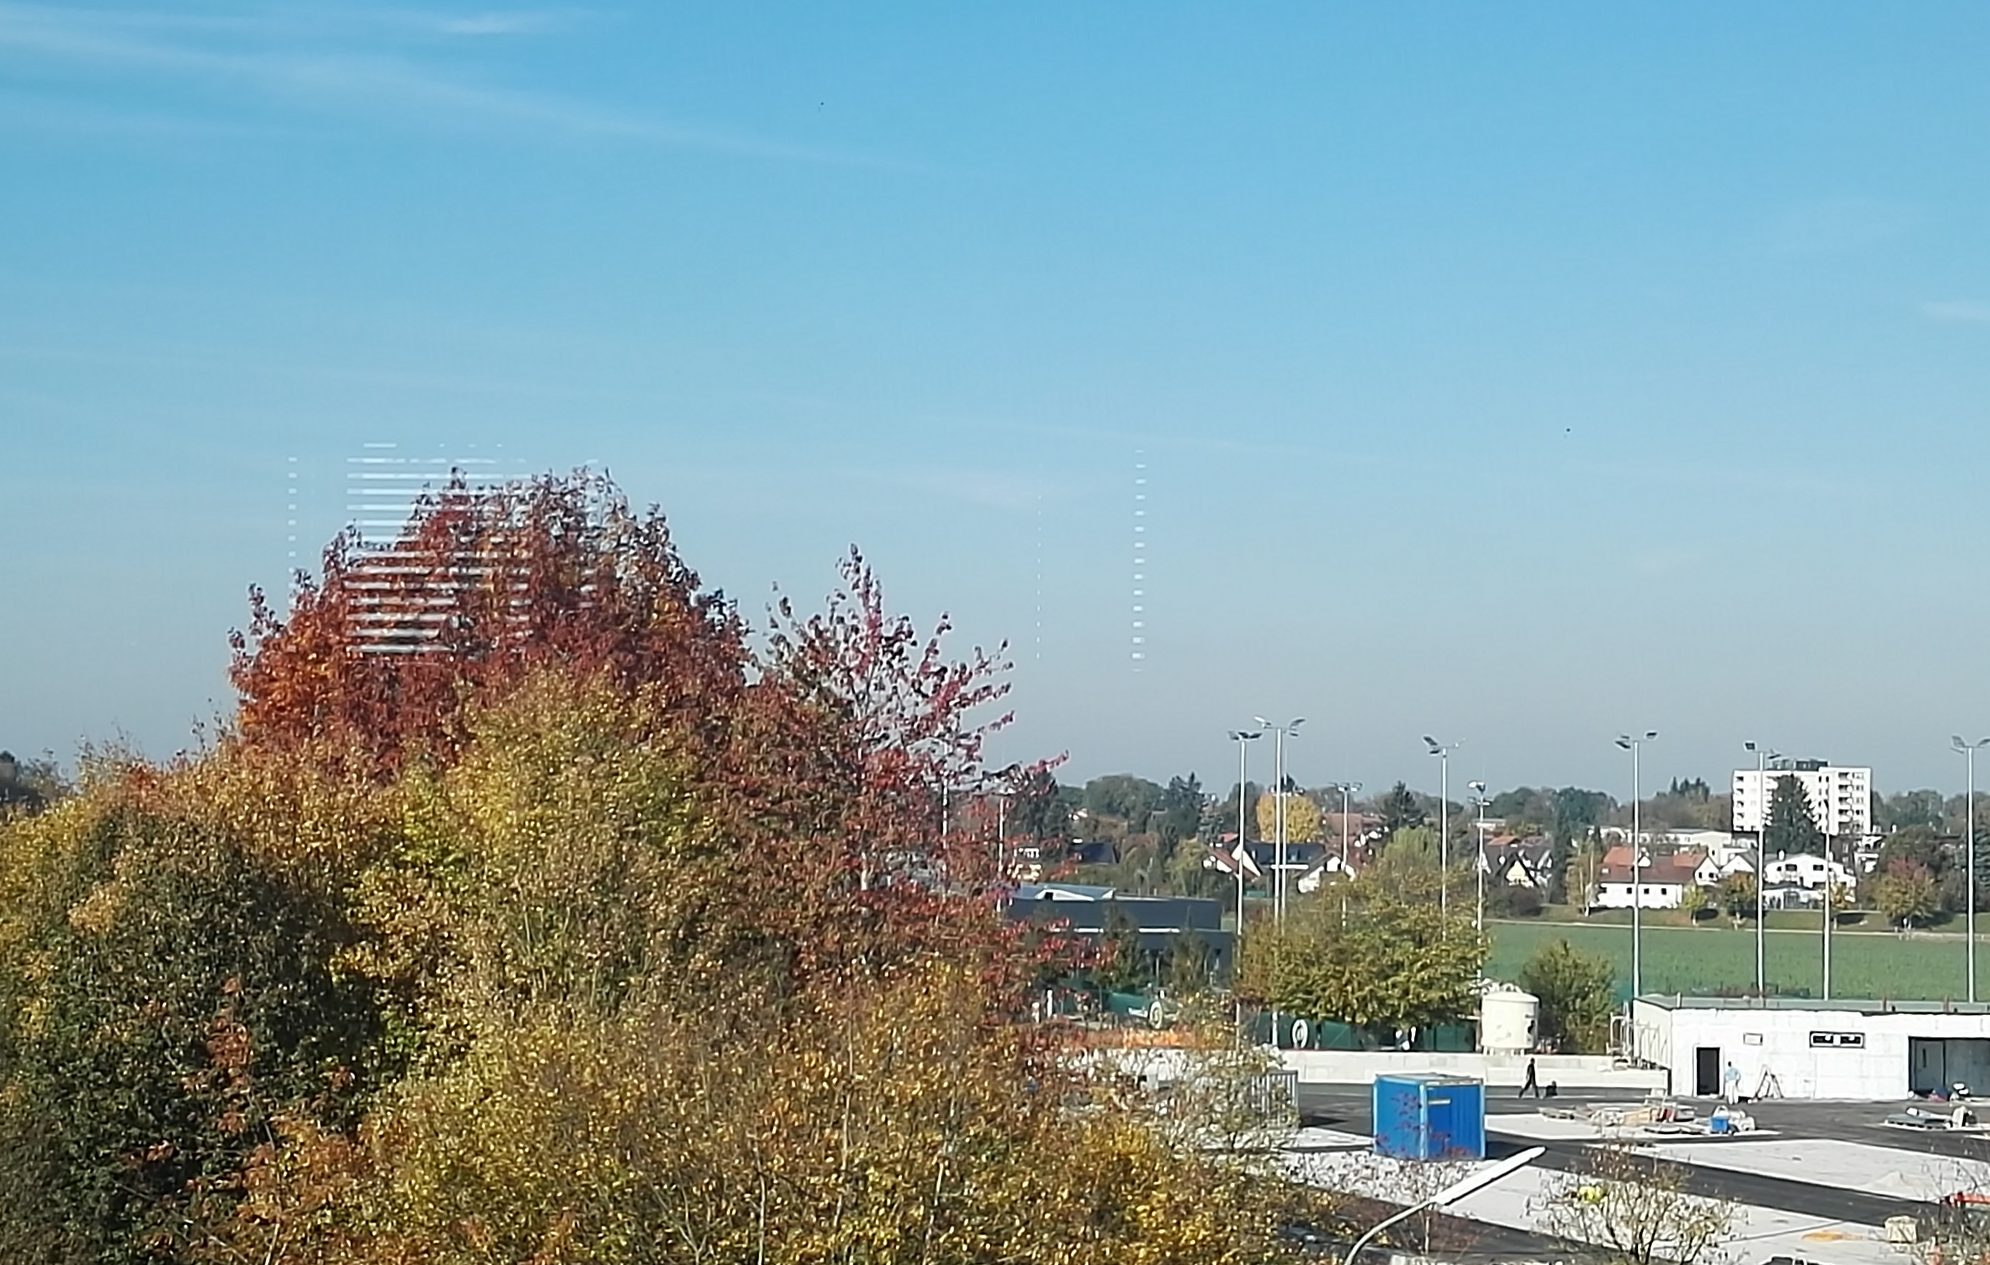 Emanzipation & Sauerbraten